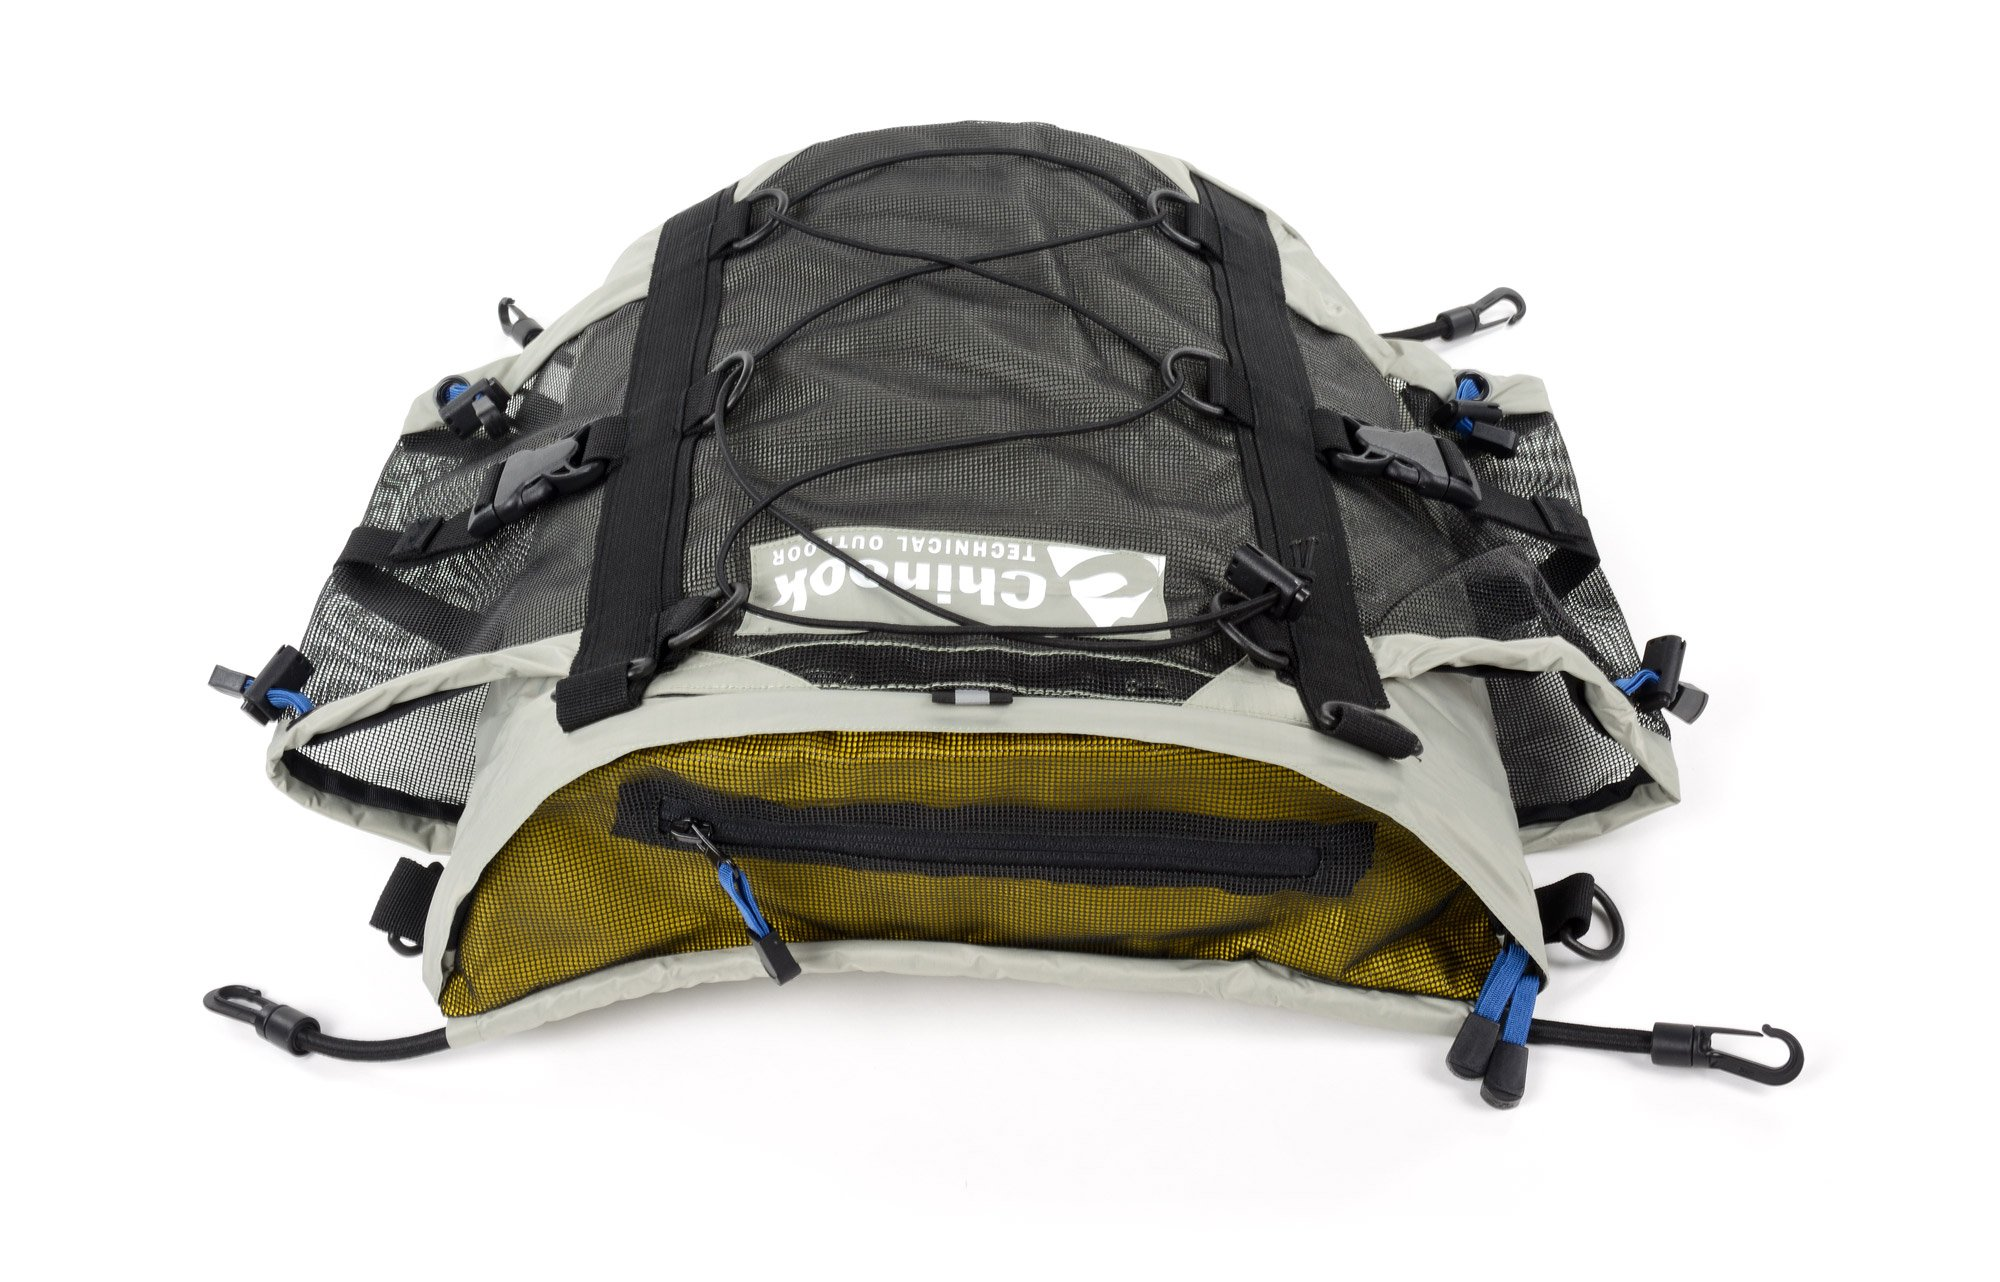 Chinook Aquatidal 25 Deck Bag (Yellow)